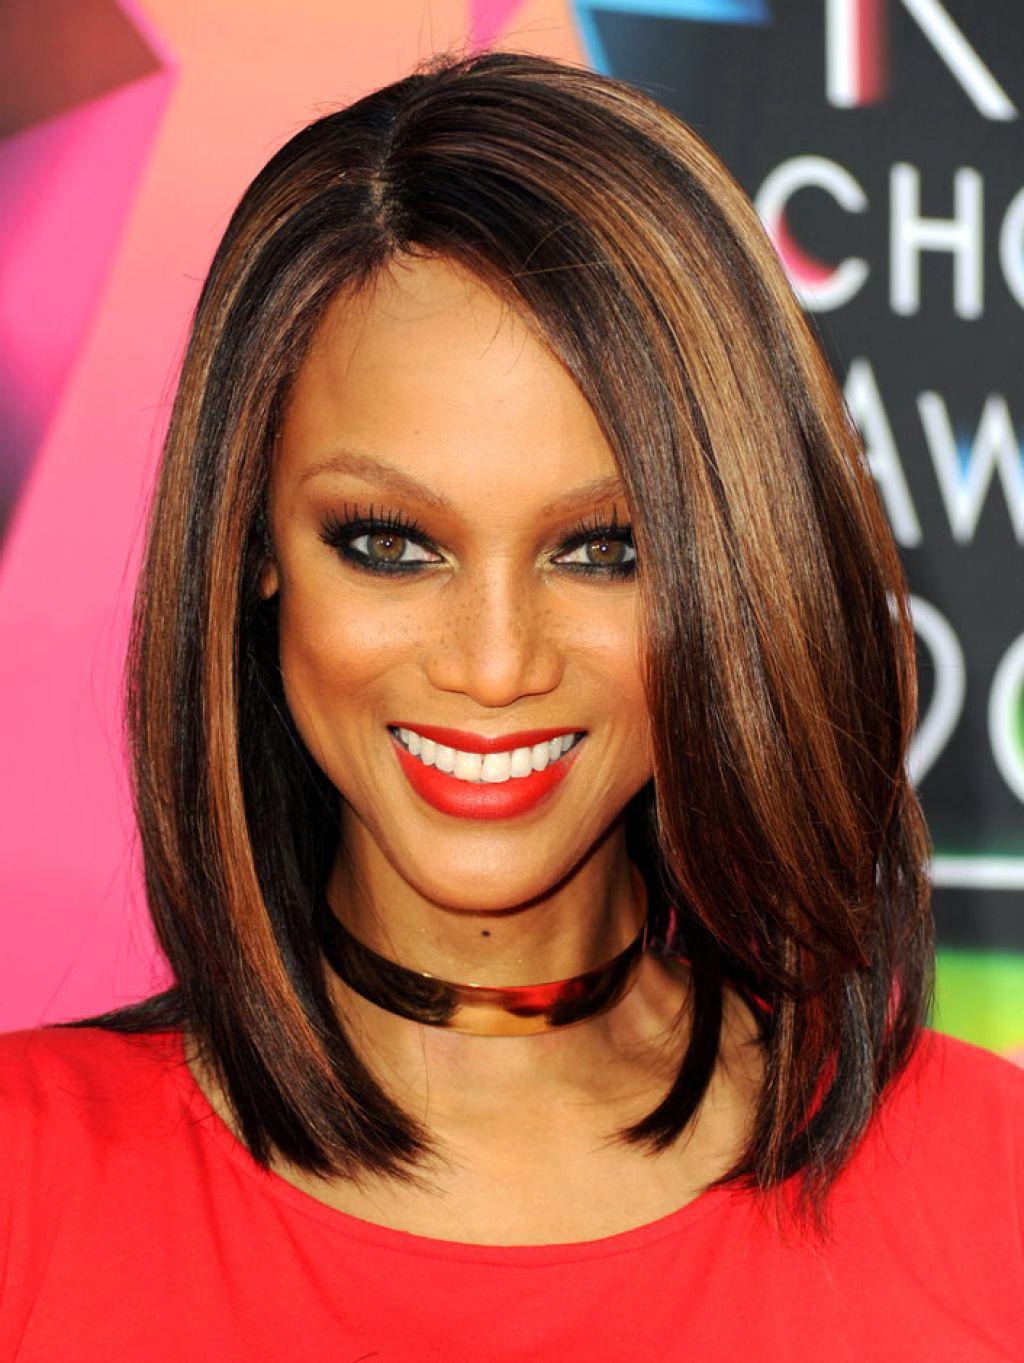 50 Best Medium Hairstyles For Black African American Women – 2018 In Newest Medium Hairstyles For Black Hair (Gallery 16 of 20)